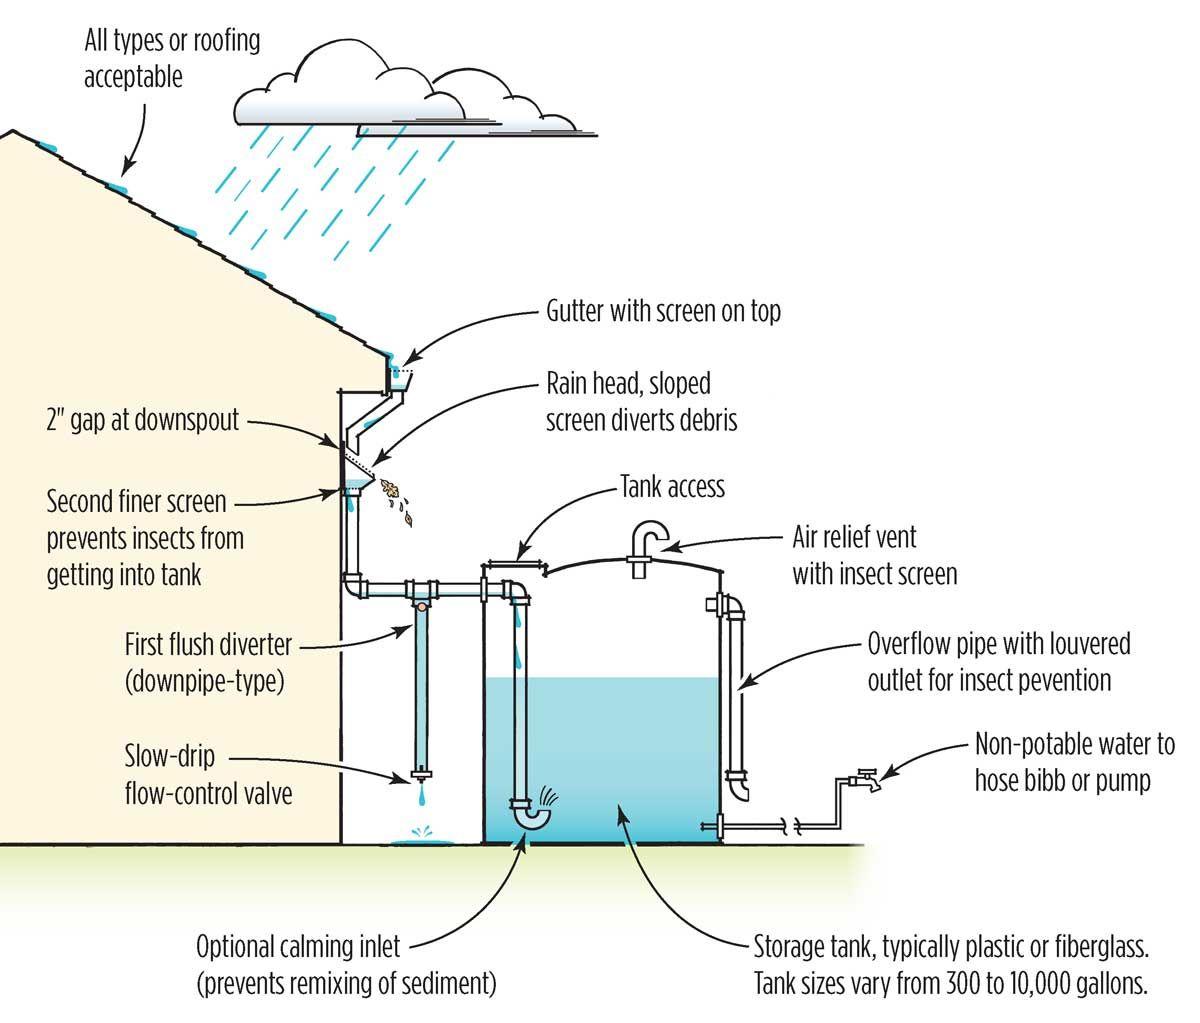 medium resolution of dry system schematic